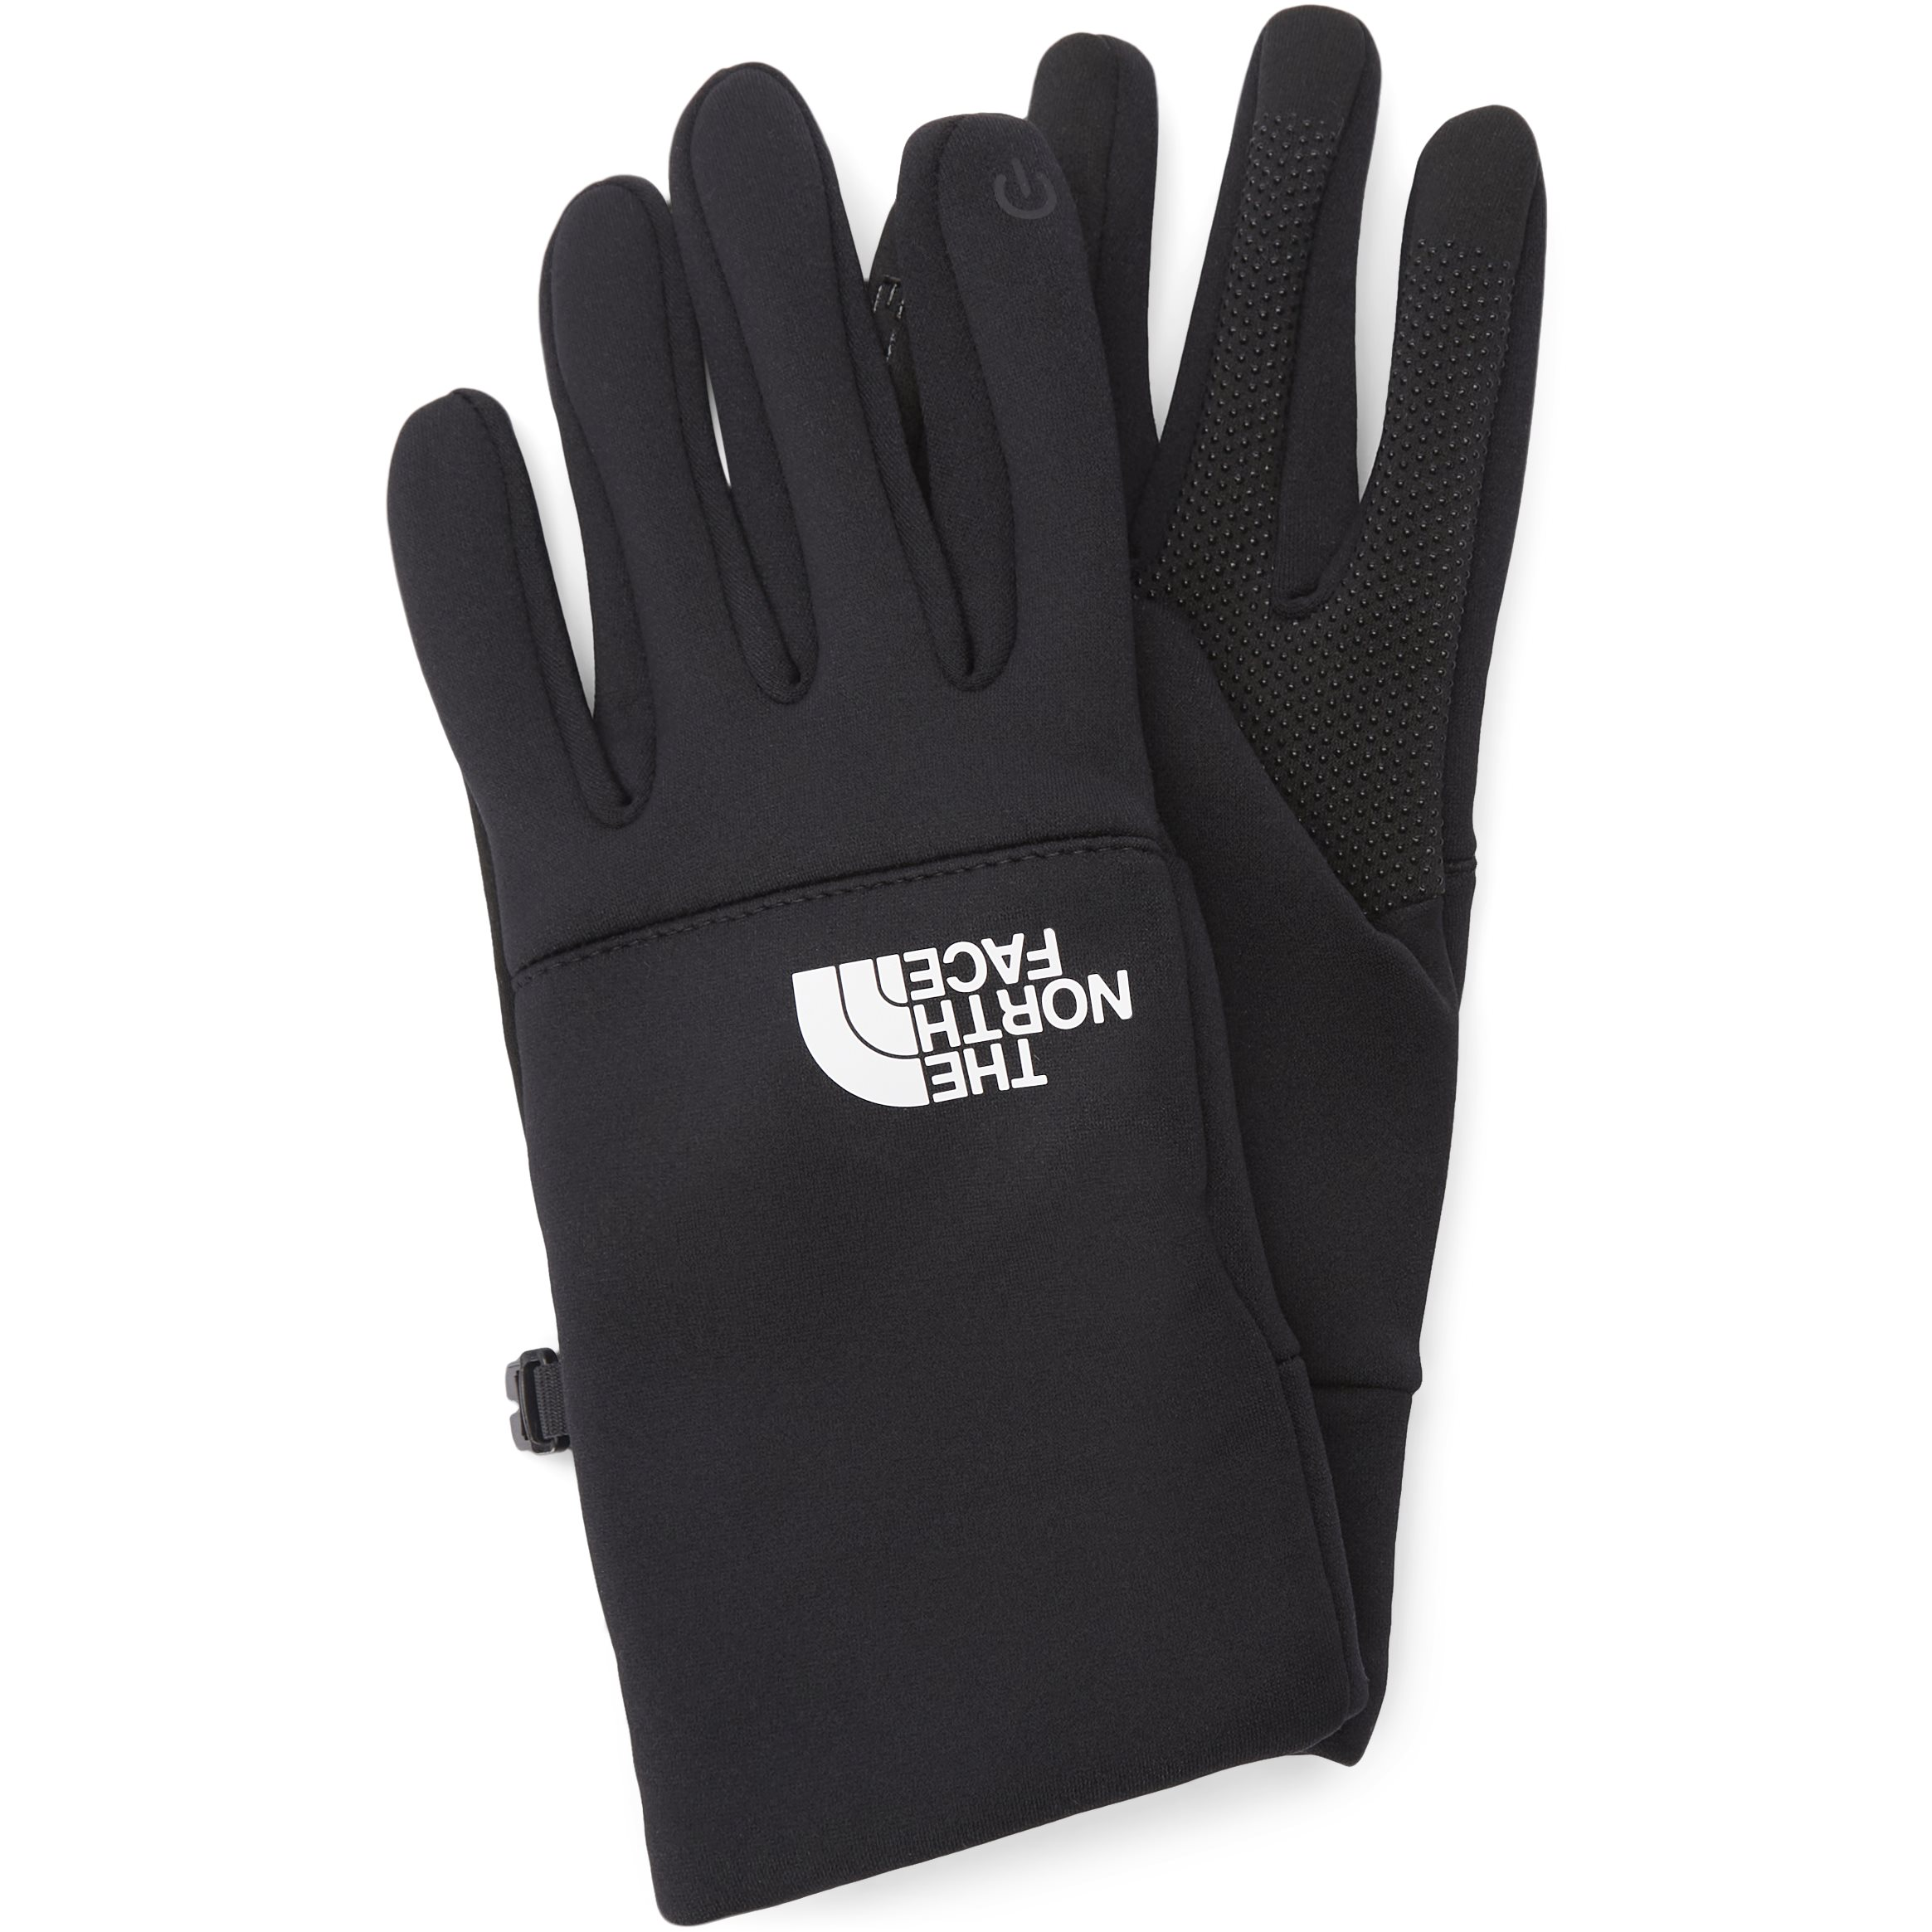 Etip Glove - Handskar - Svart